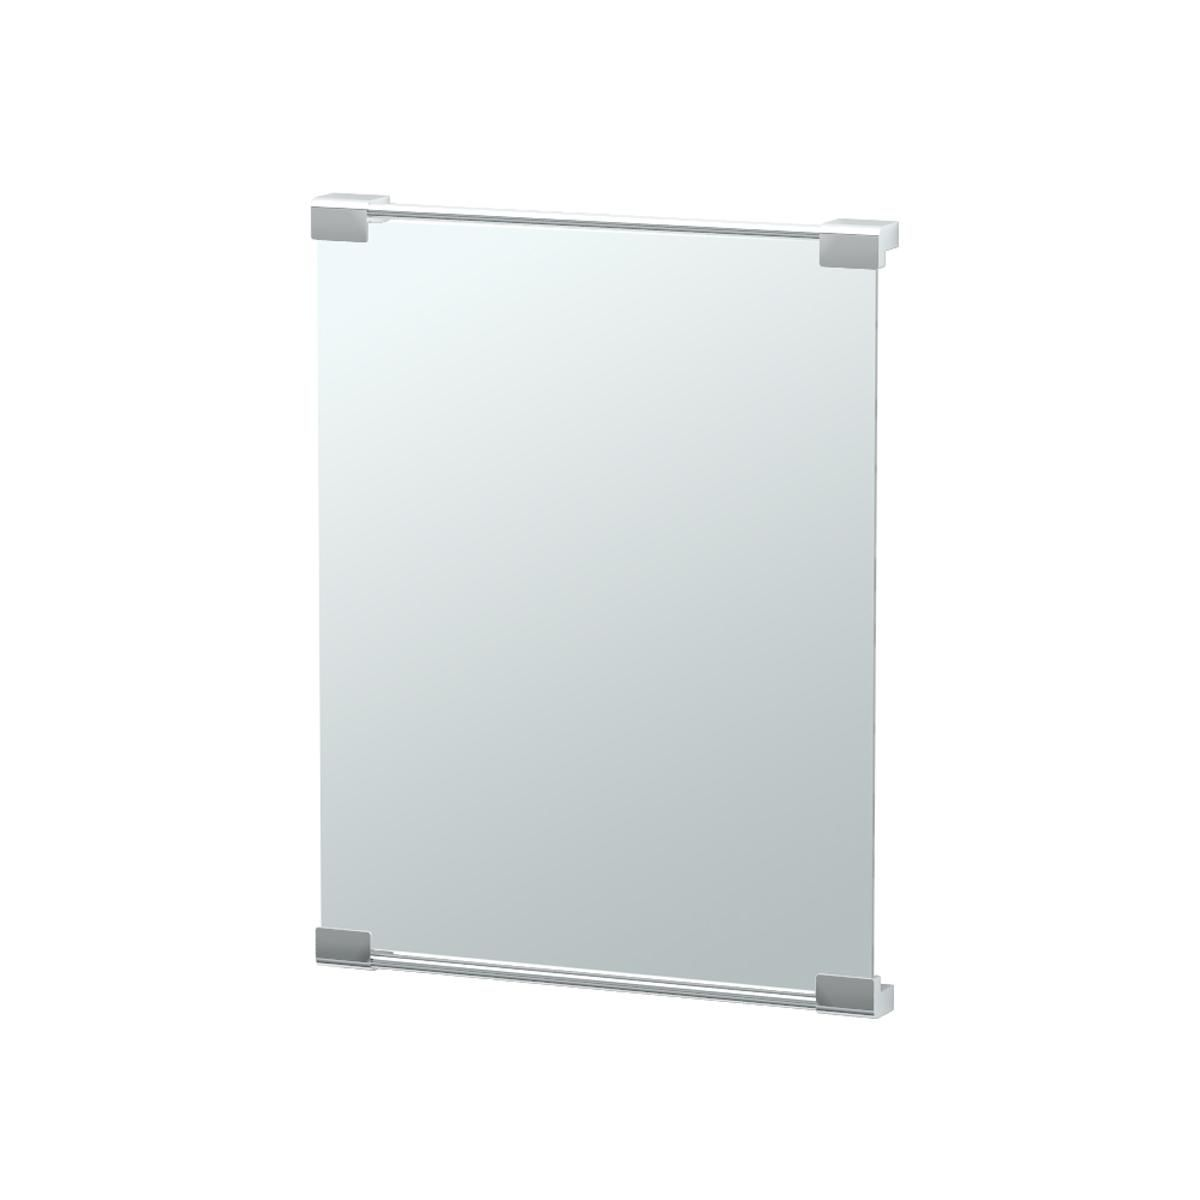 Minimalist Rectangular Bracket Mirror - Small